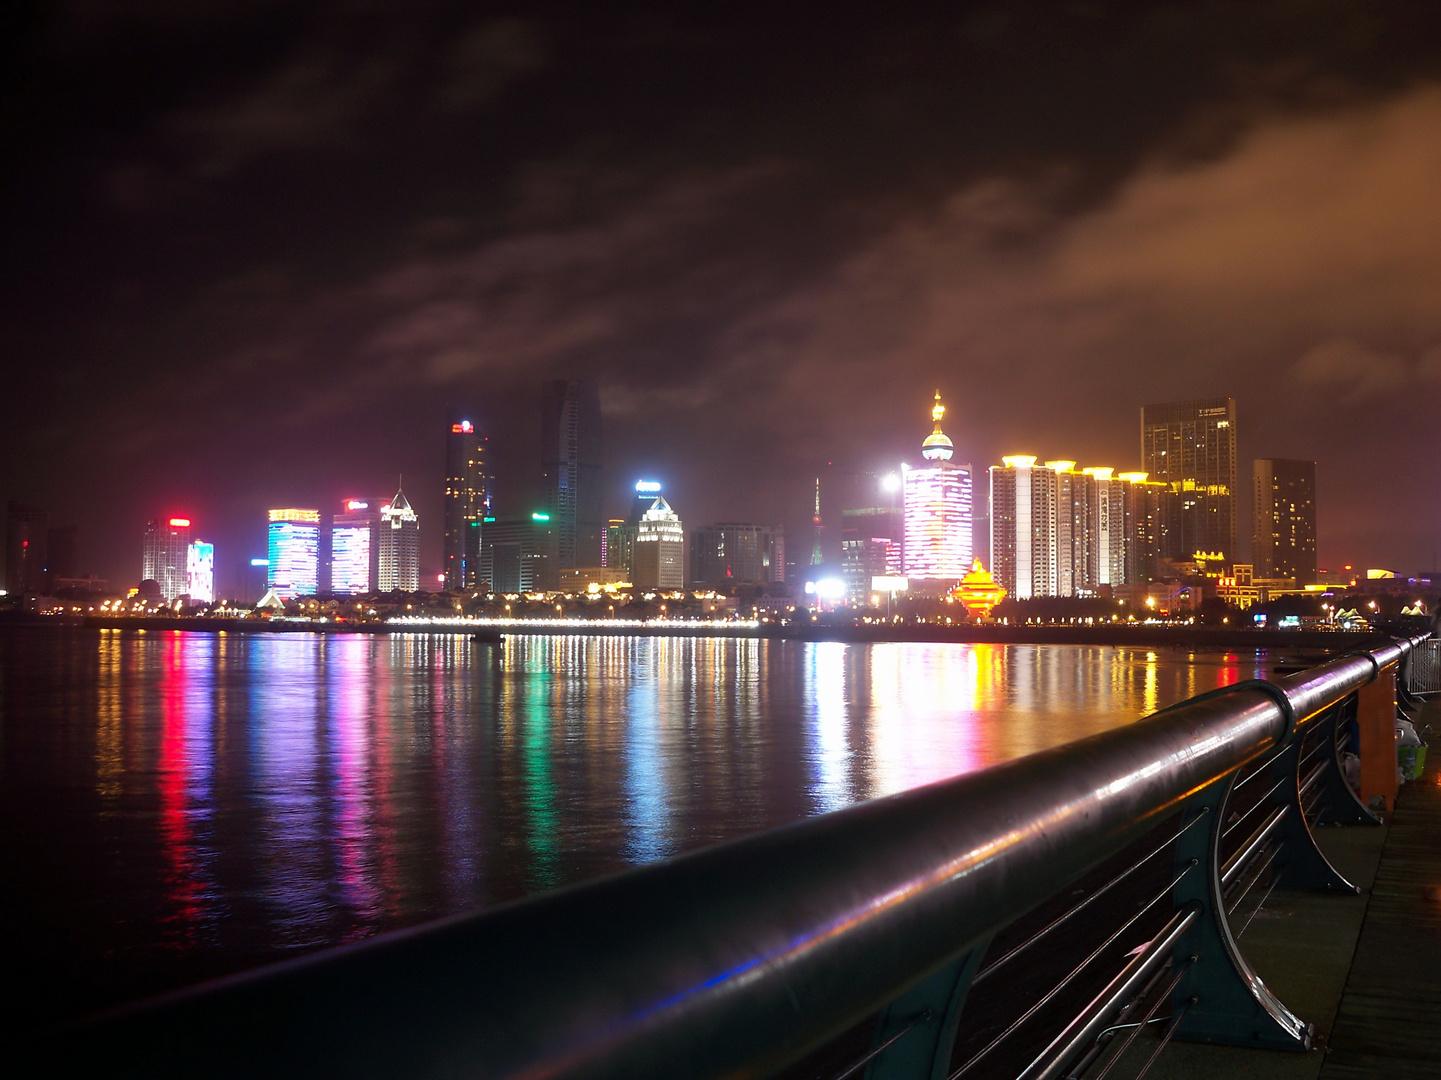 Paseo nocturno en Qingdao, China